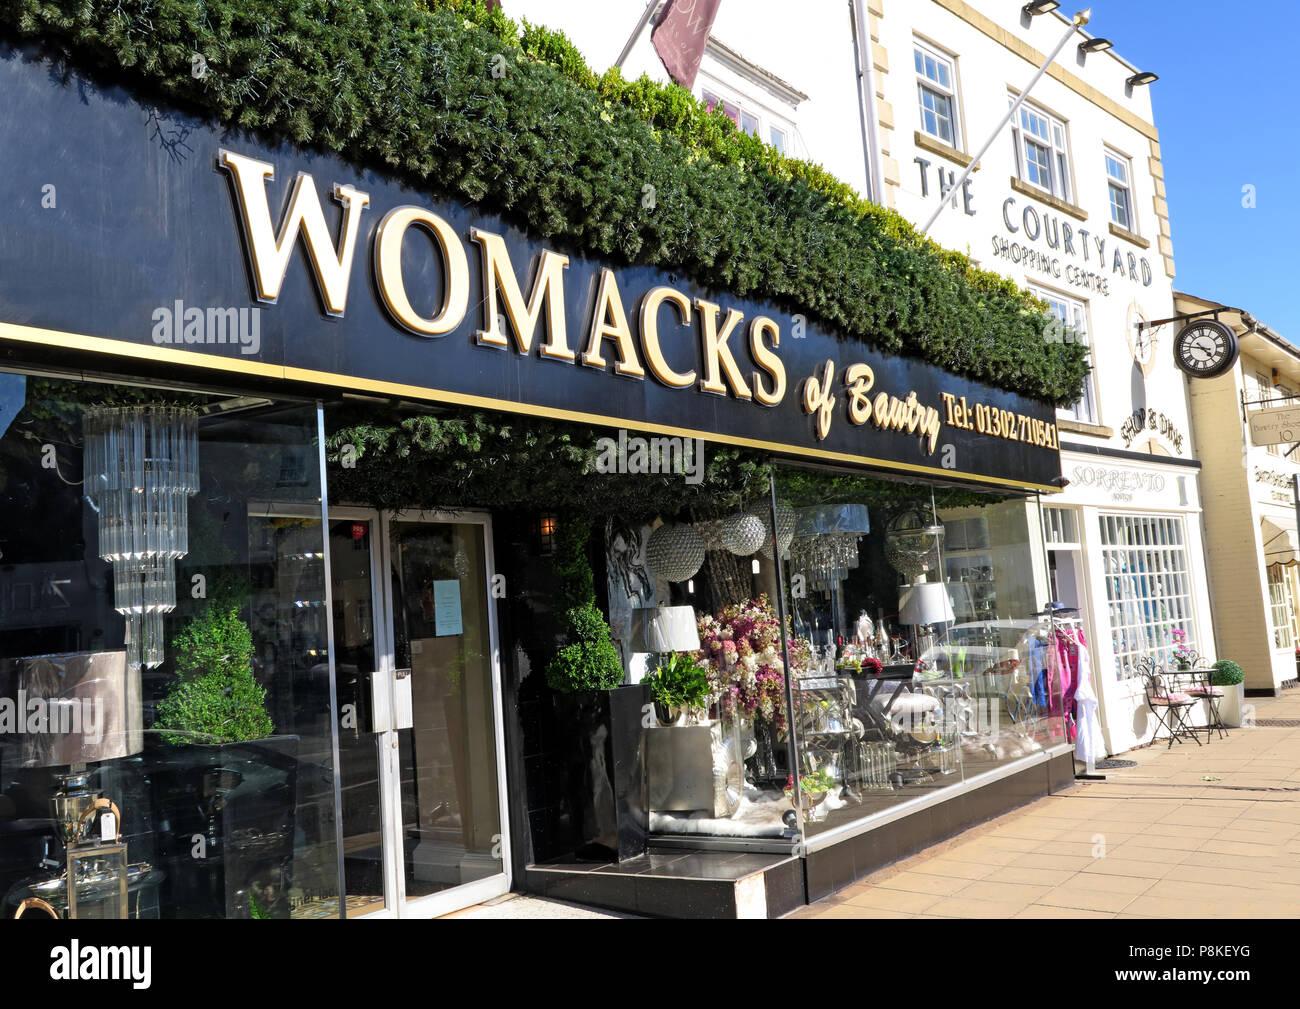 Dieses Stockfoto: Womacks von Lerwick, 16-18 High Street, Bawtry, Doncaster, South Yorkshire, England, UK, DN 10 6 JE - P8KEYG